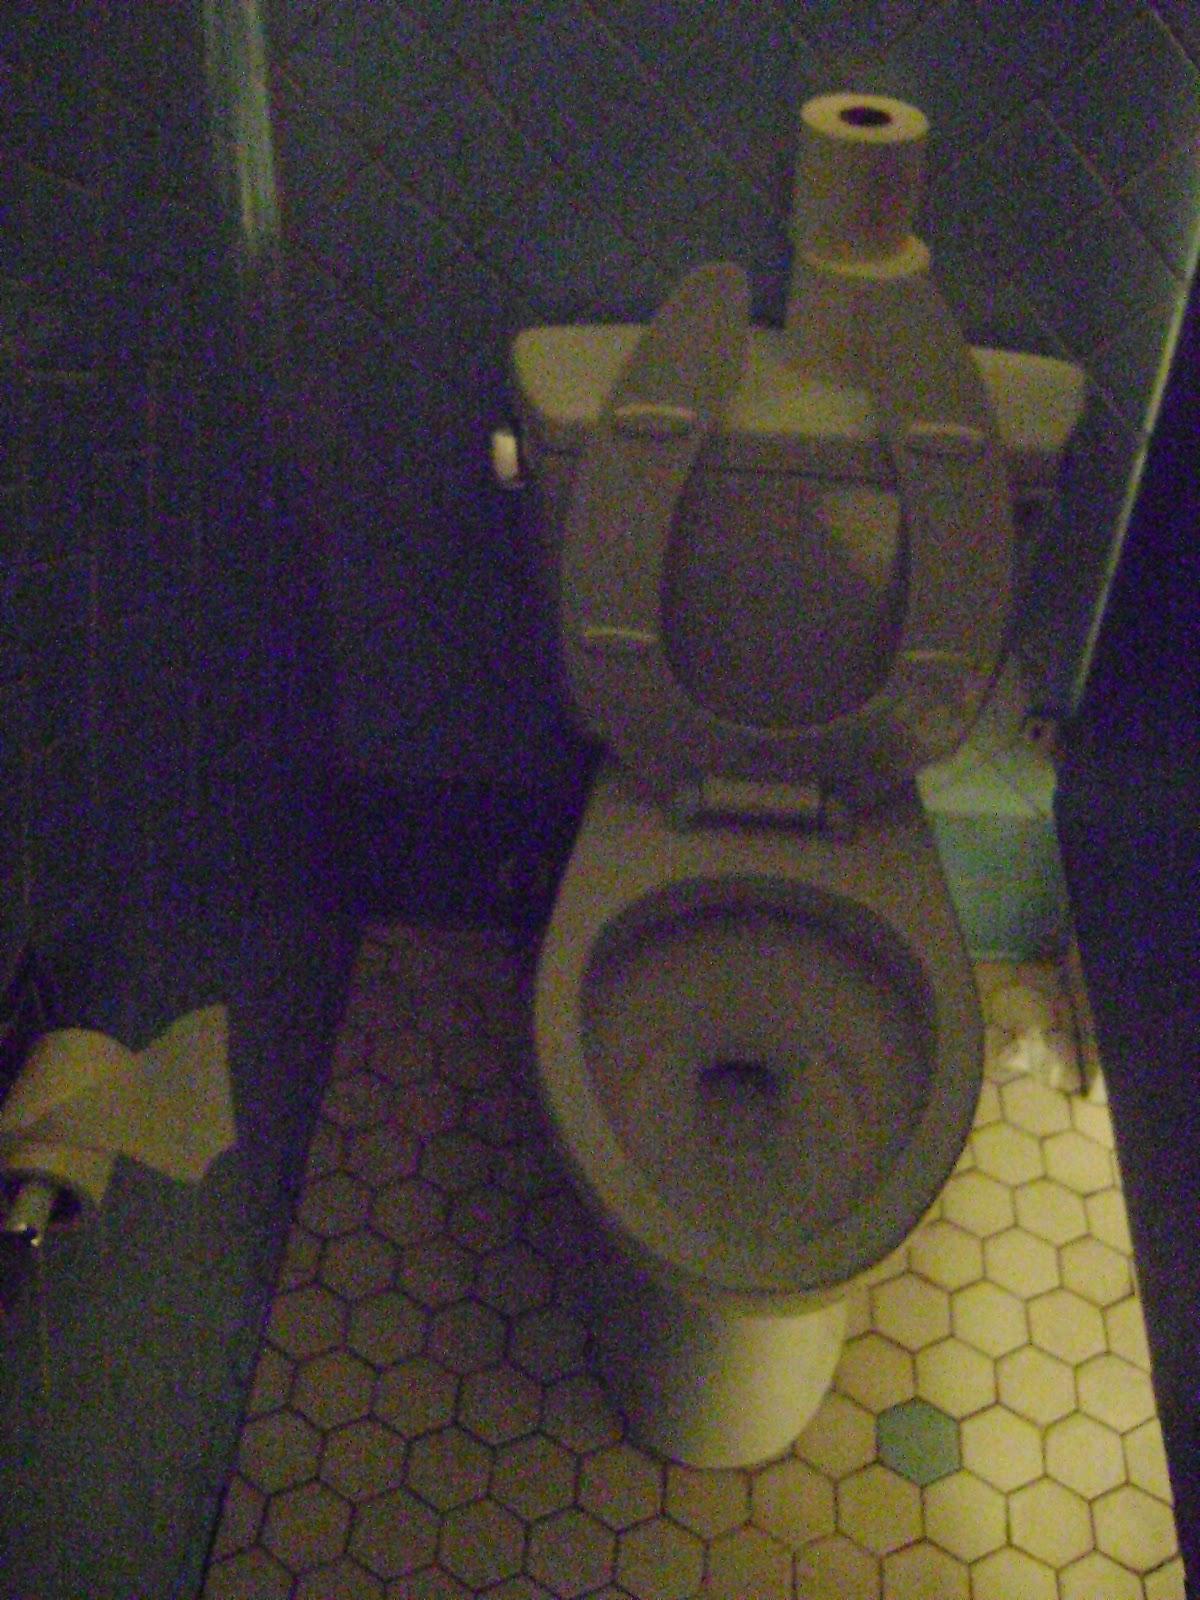 Judy Garland Died On Toilet